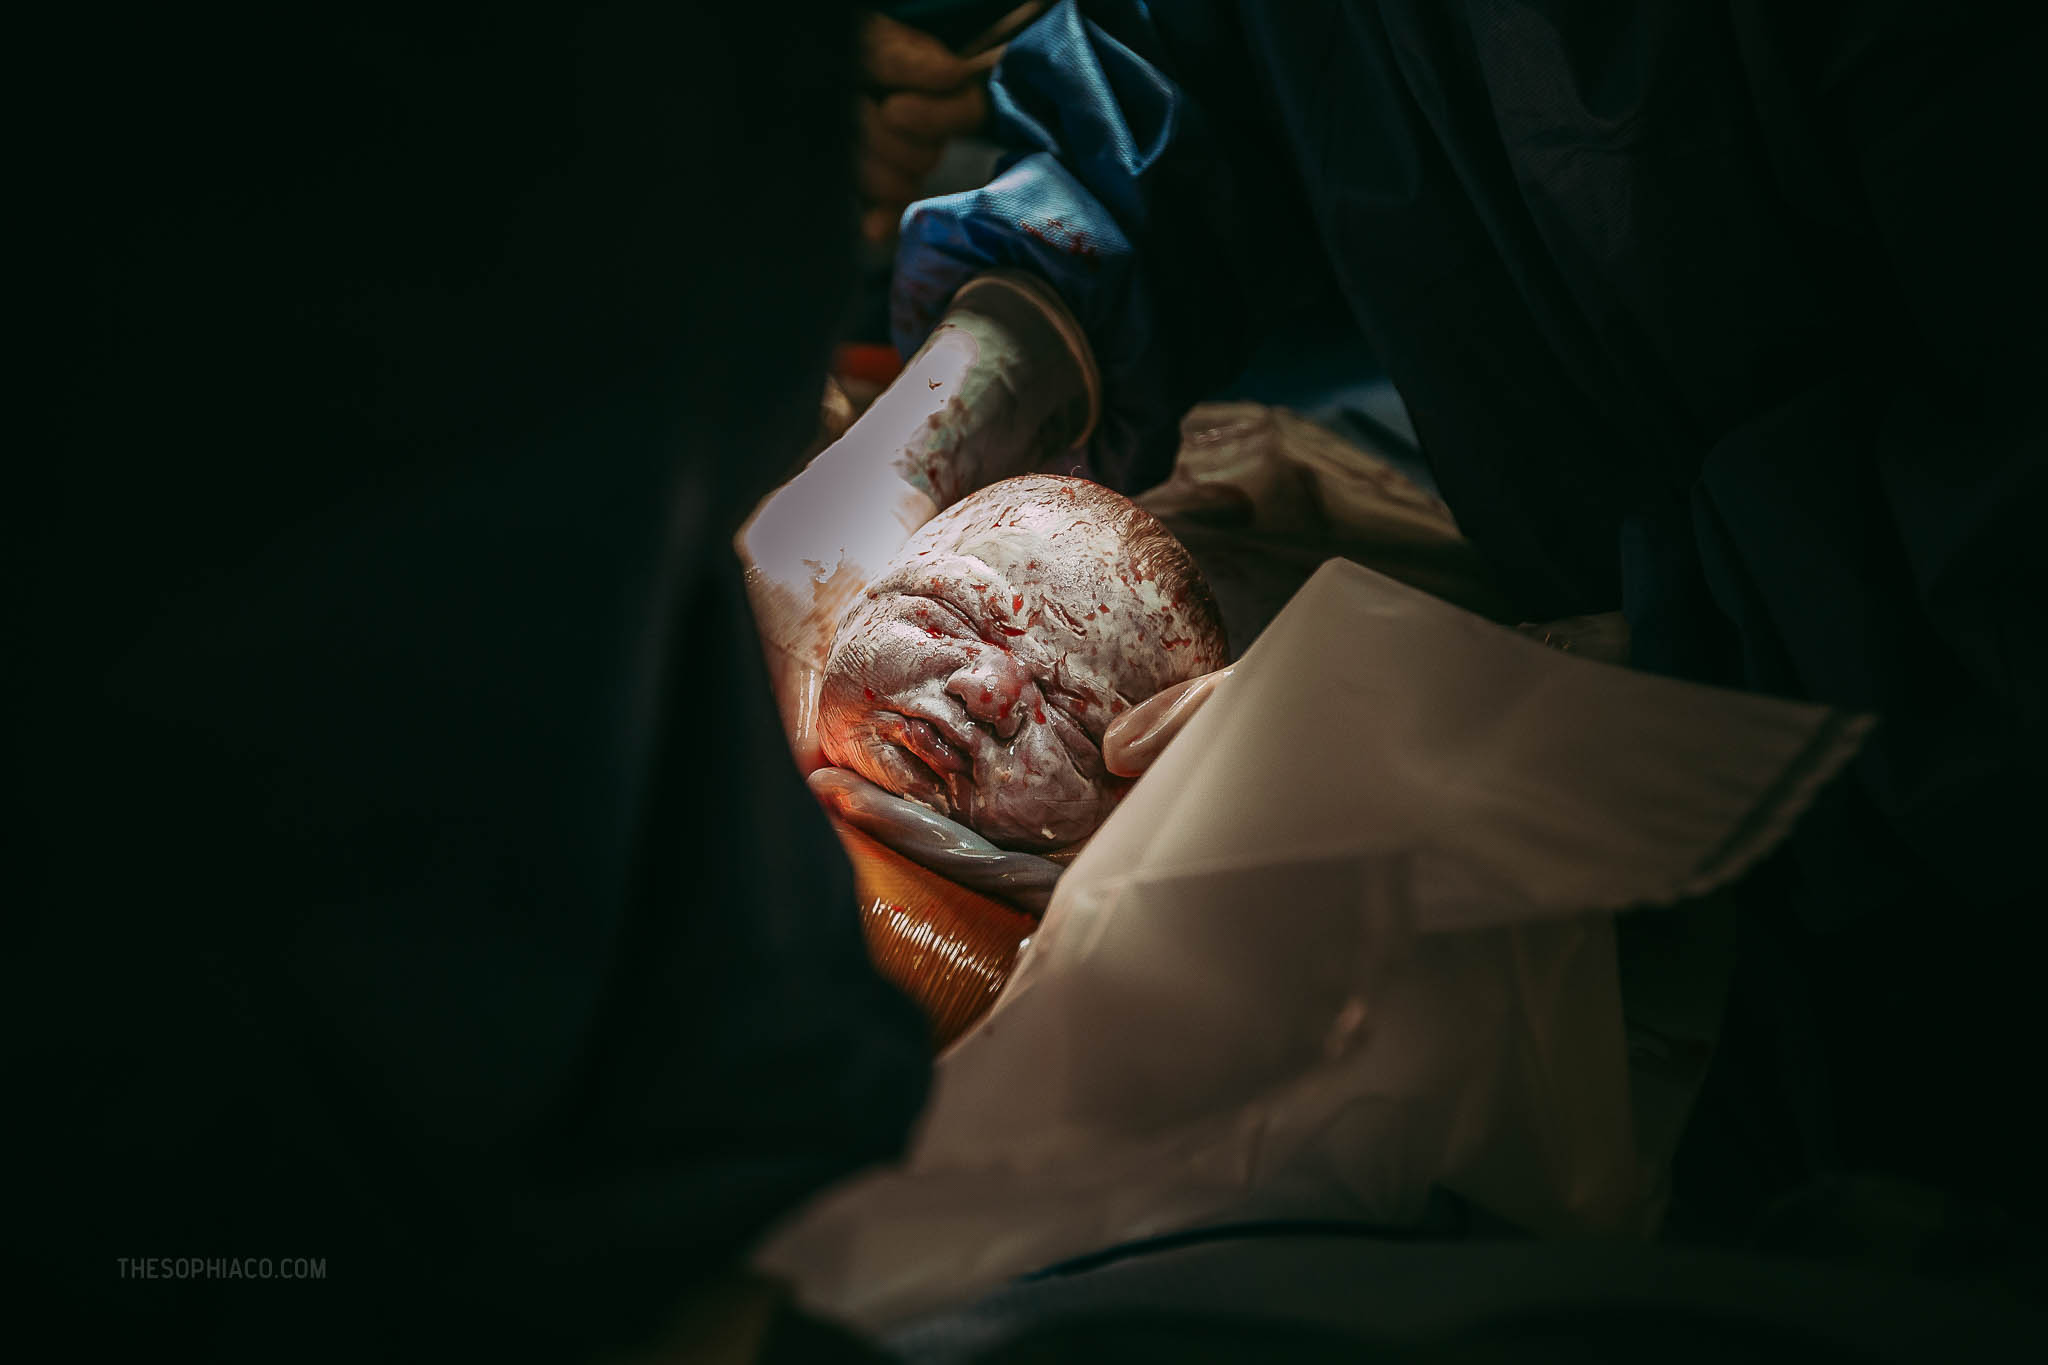 Oahu-Birth-Photographer-scheduled-cesarean-kaiser-15.jpg